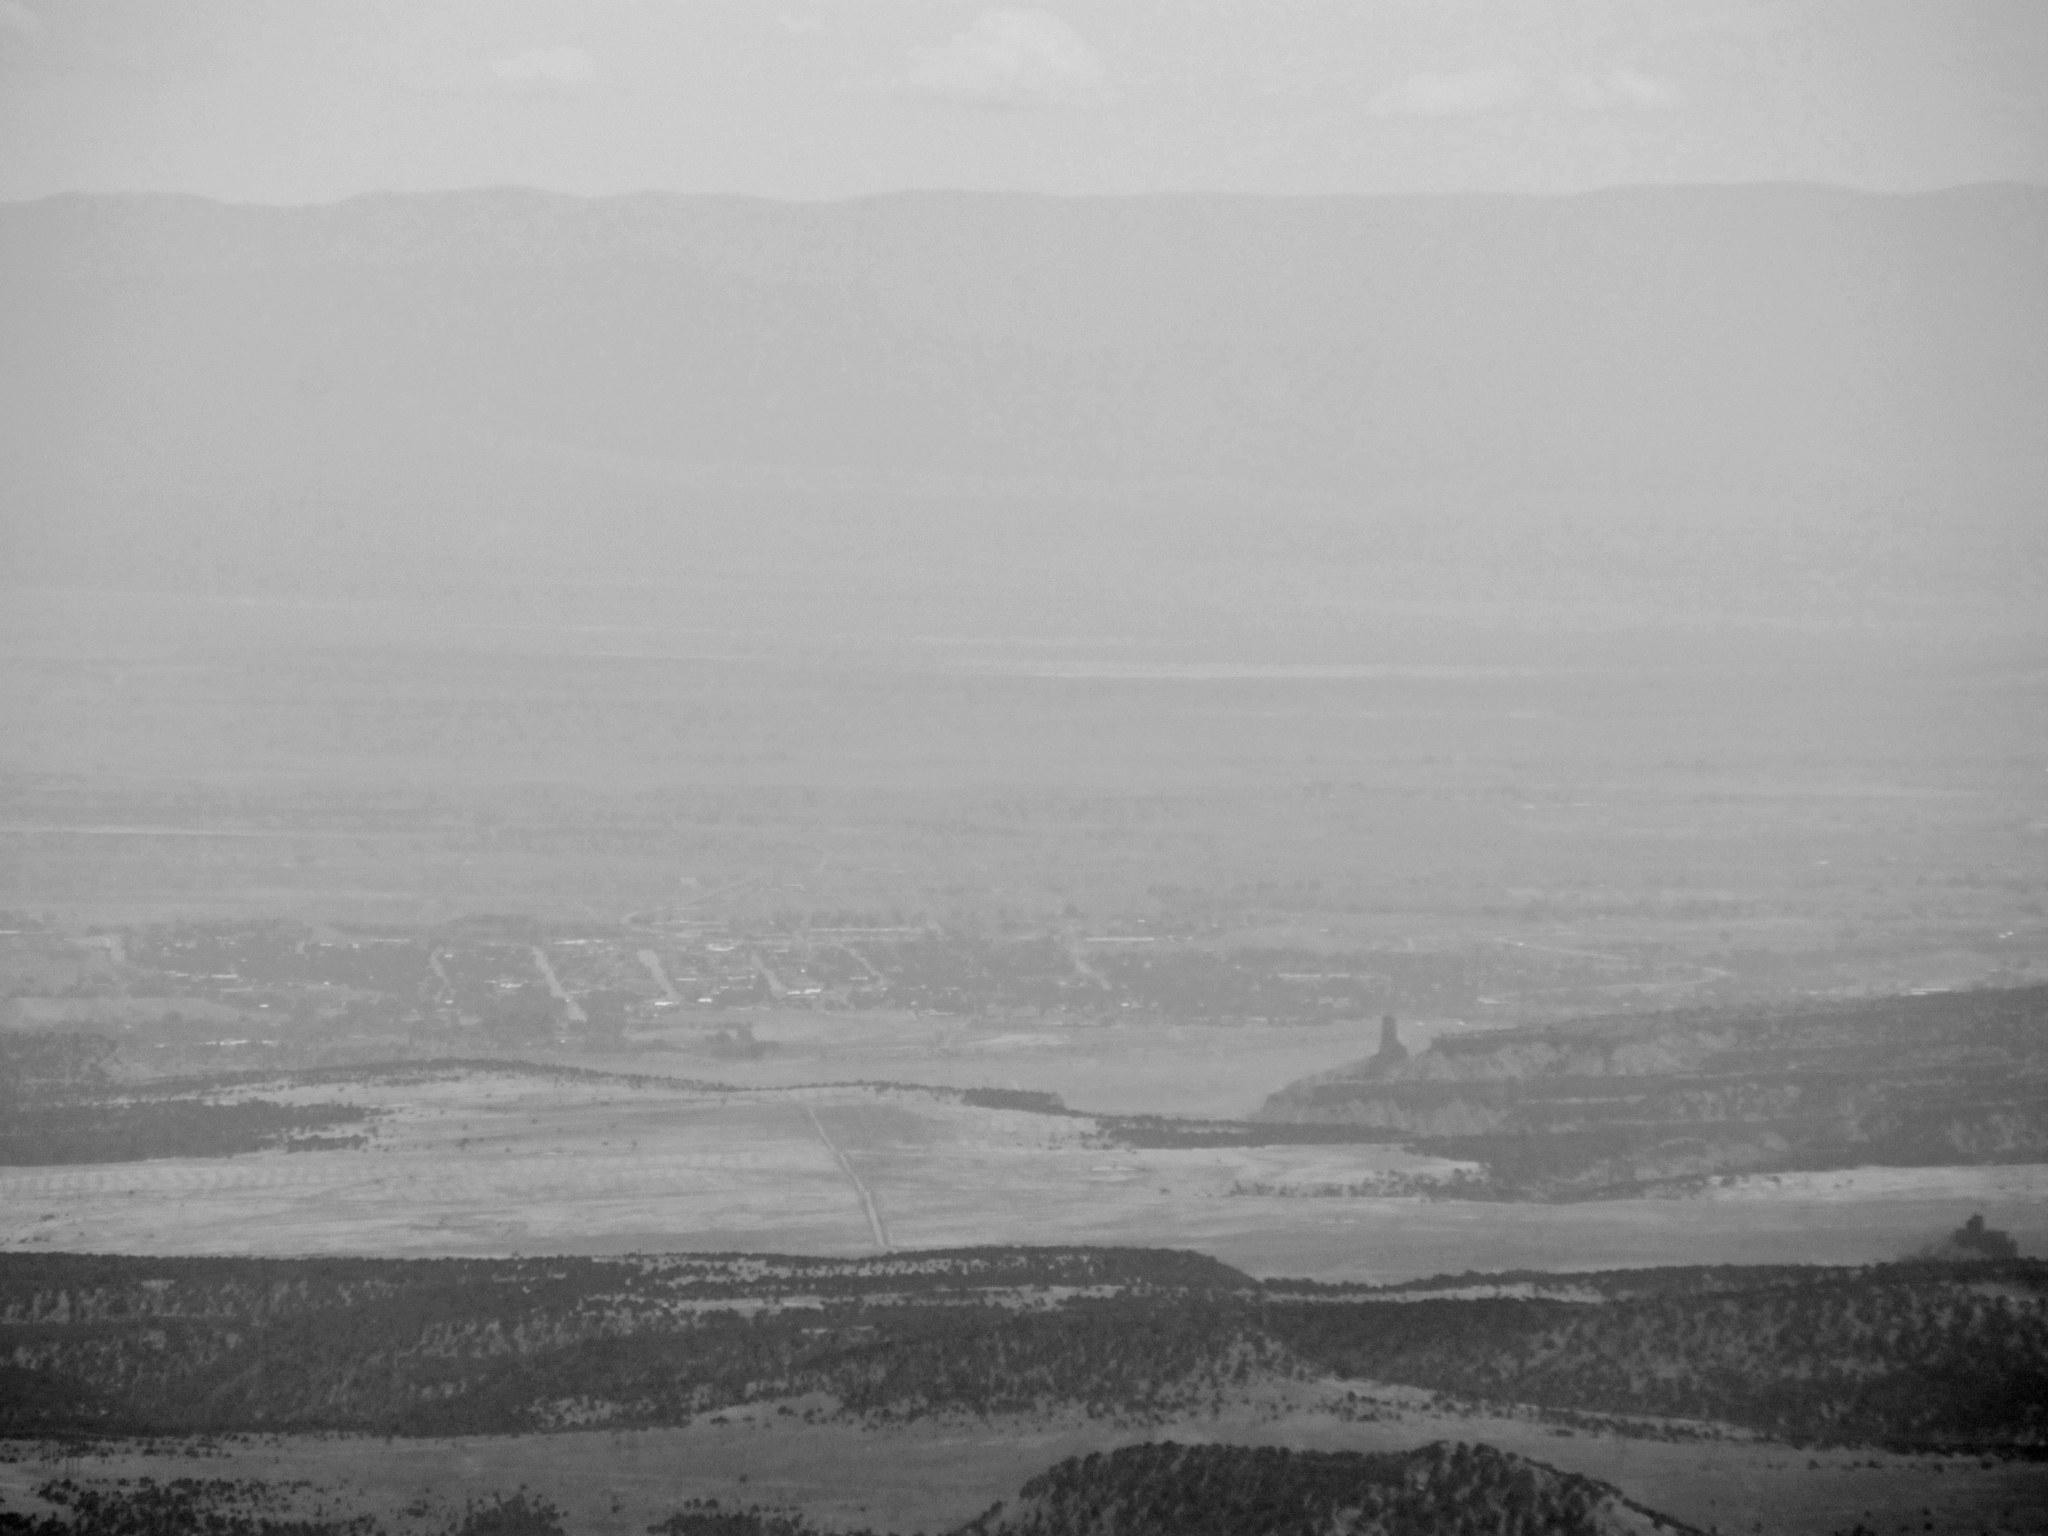 Photo: Hazy, black and white shot showing Price and Pinnacle Peak